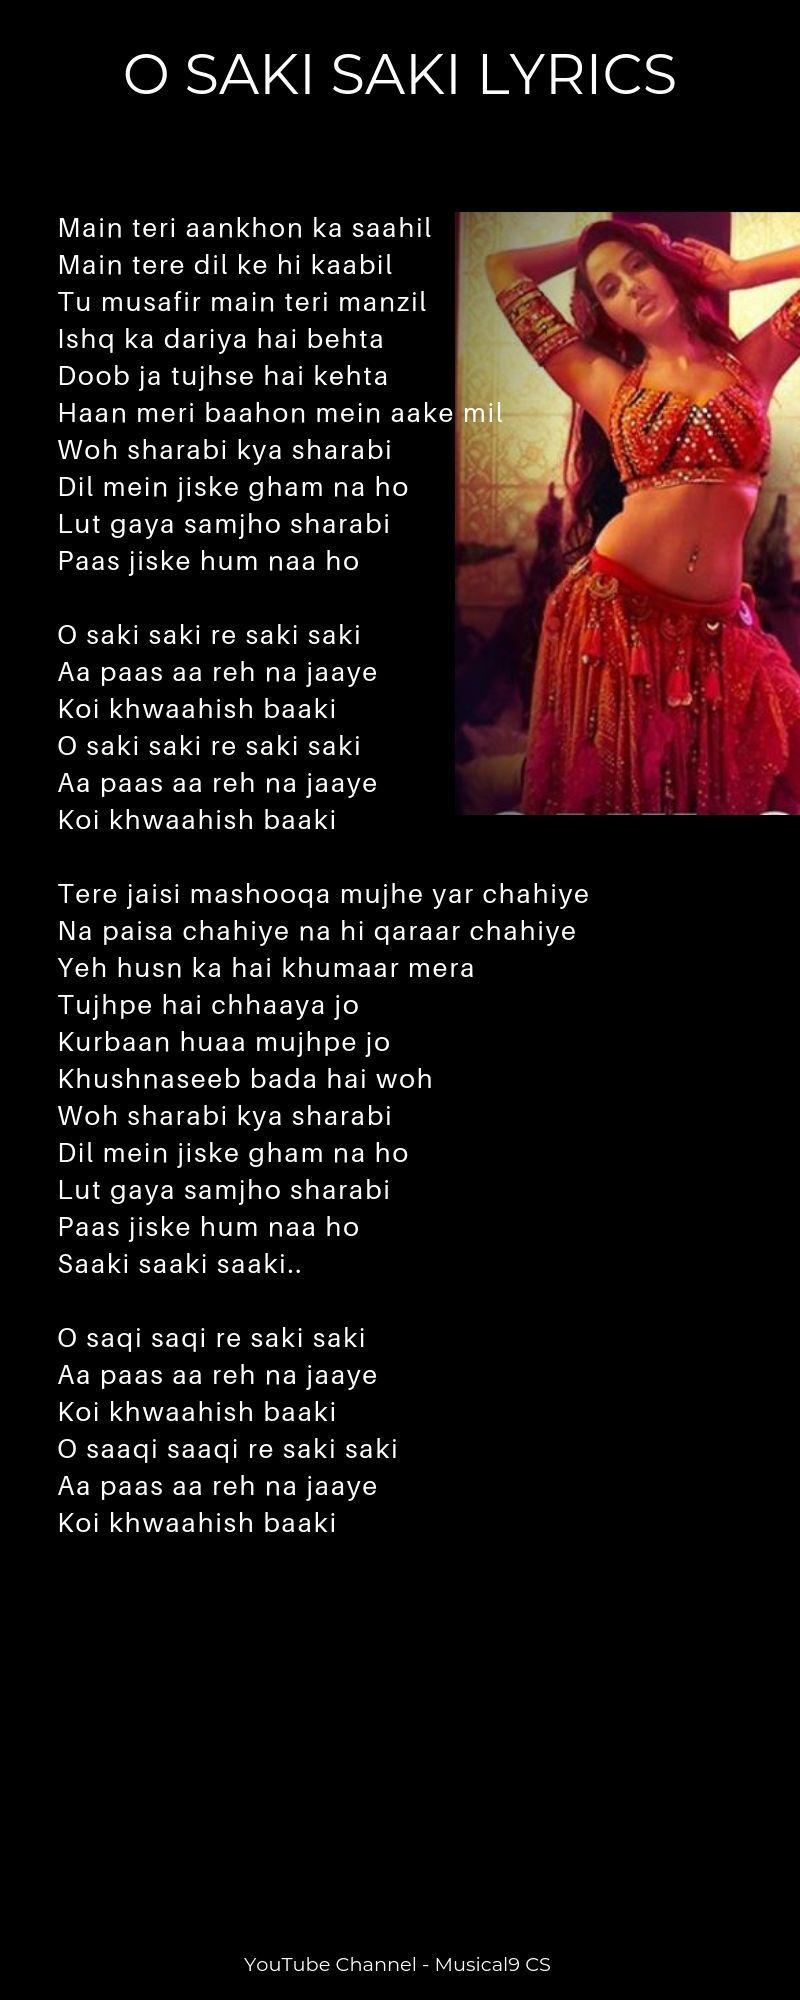 O Saki Saki Lyrics Tulsi Kumar Neha Kakkar B Praak Lyrics Neha Kakkar Lyrics Bollywood Songs